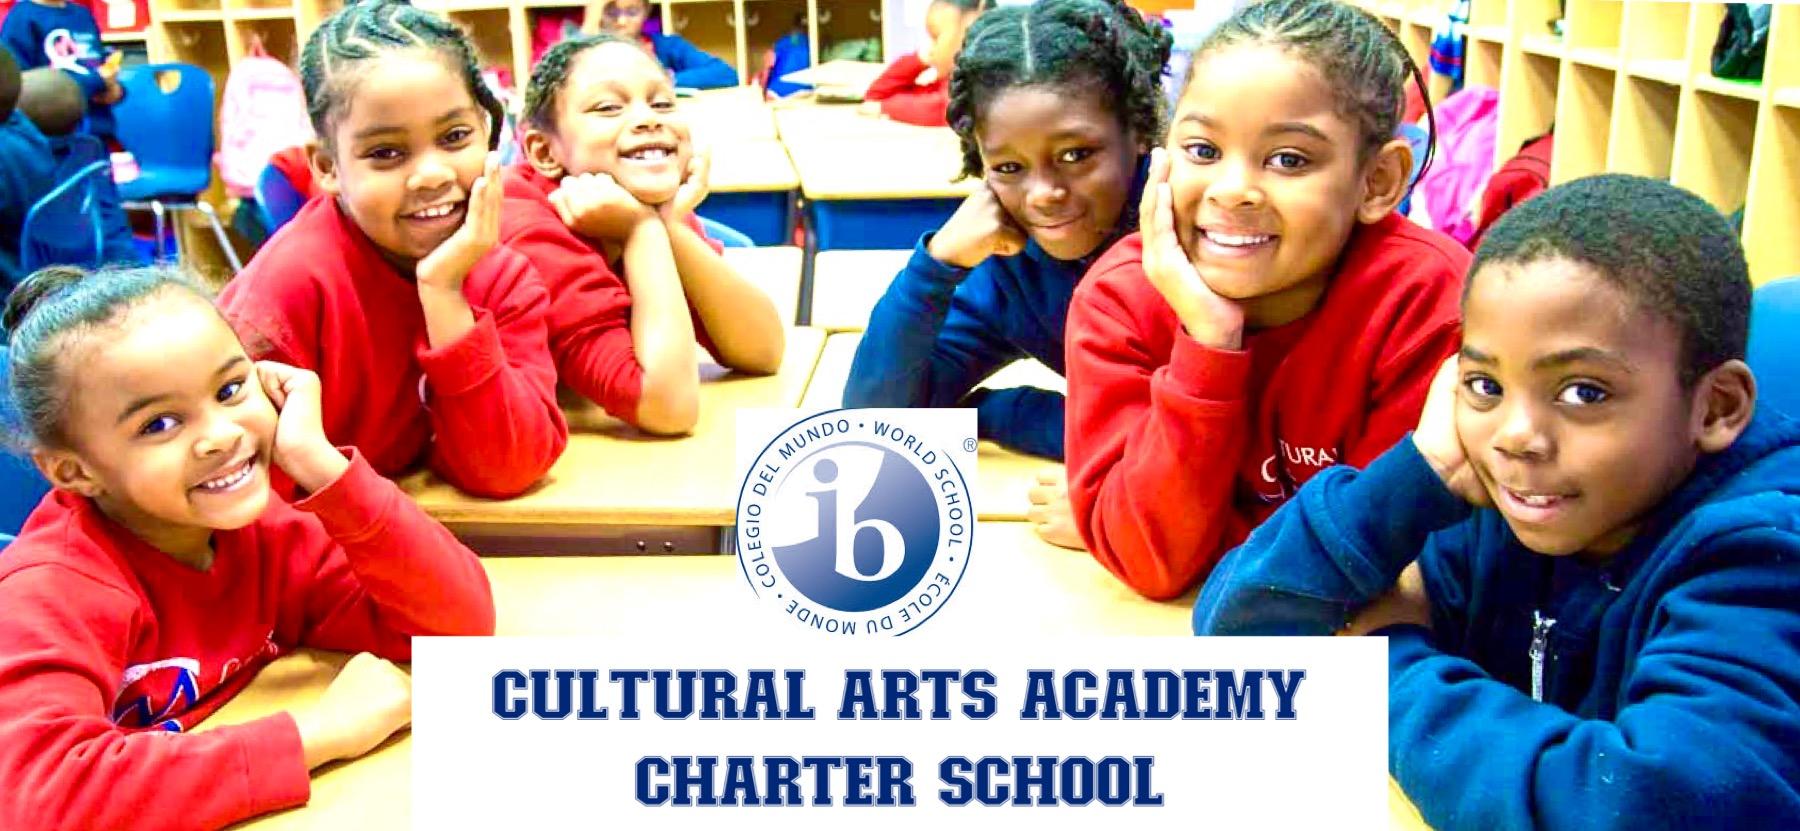 Cultural Arts Academy Charter School